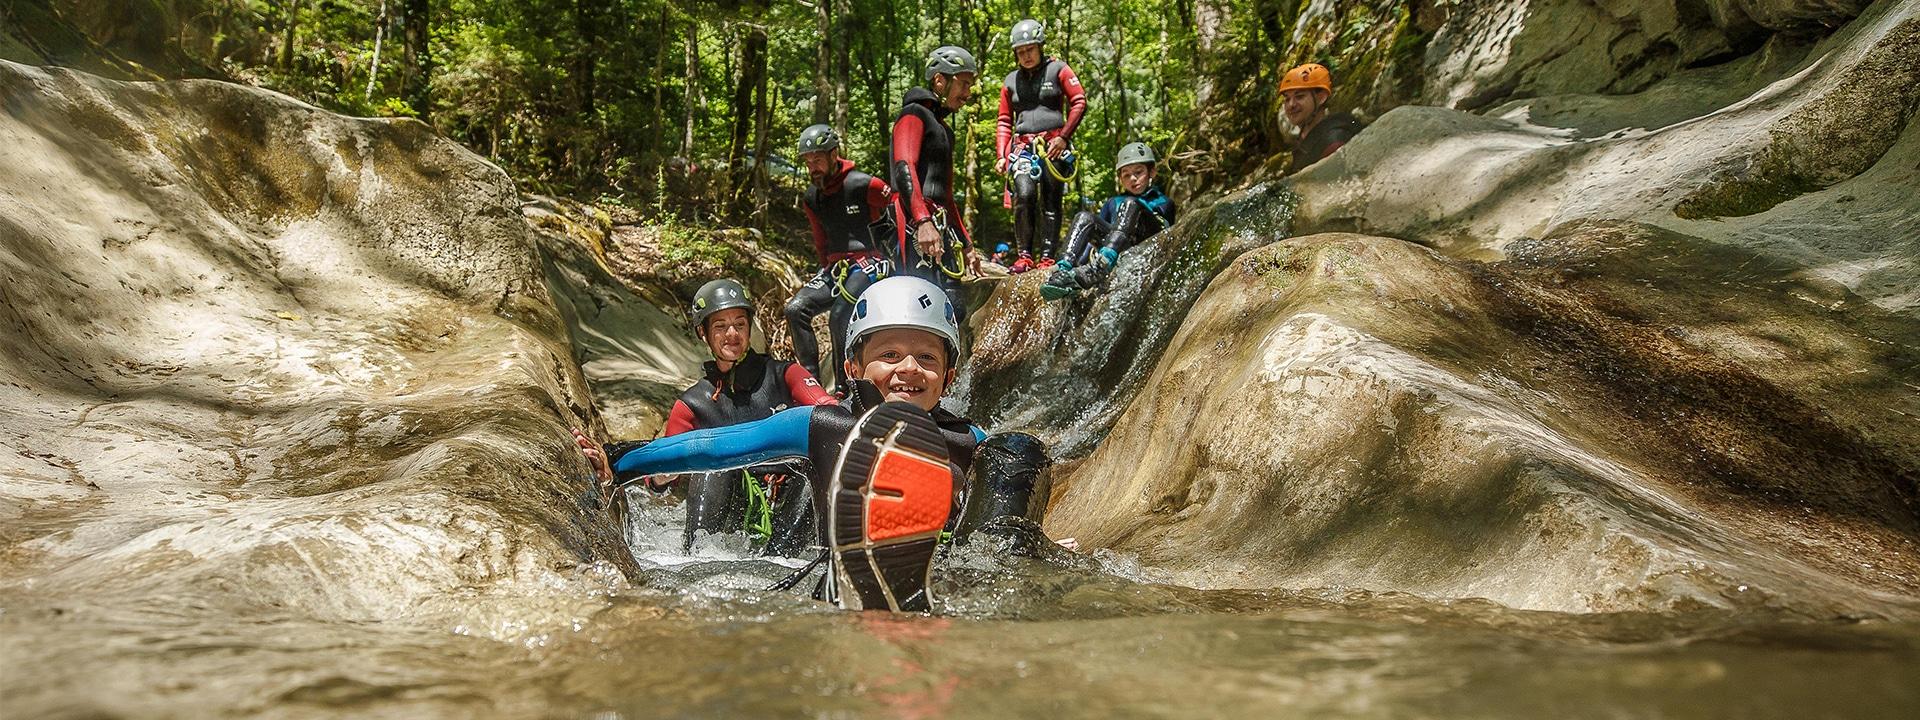 Wildwatersport